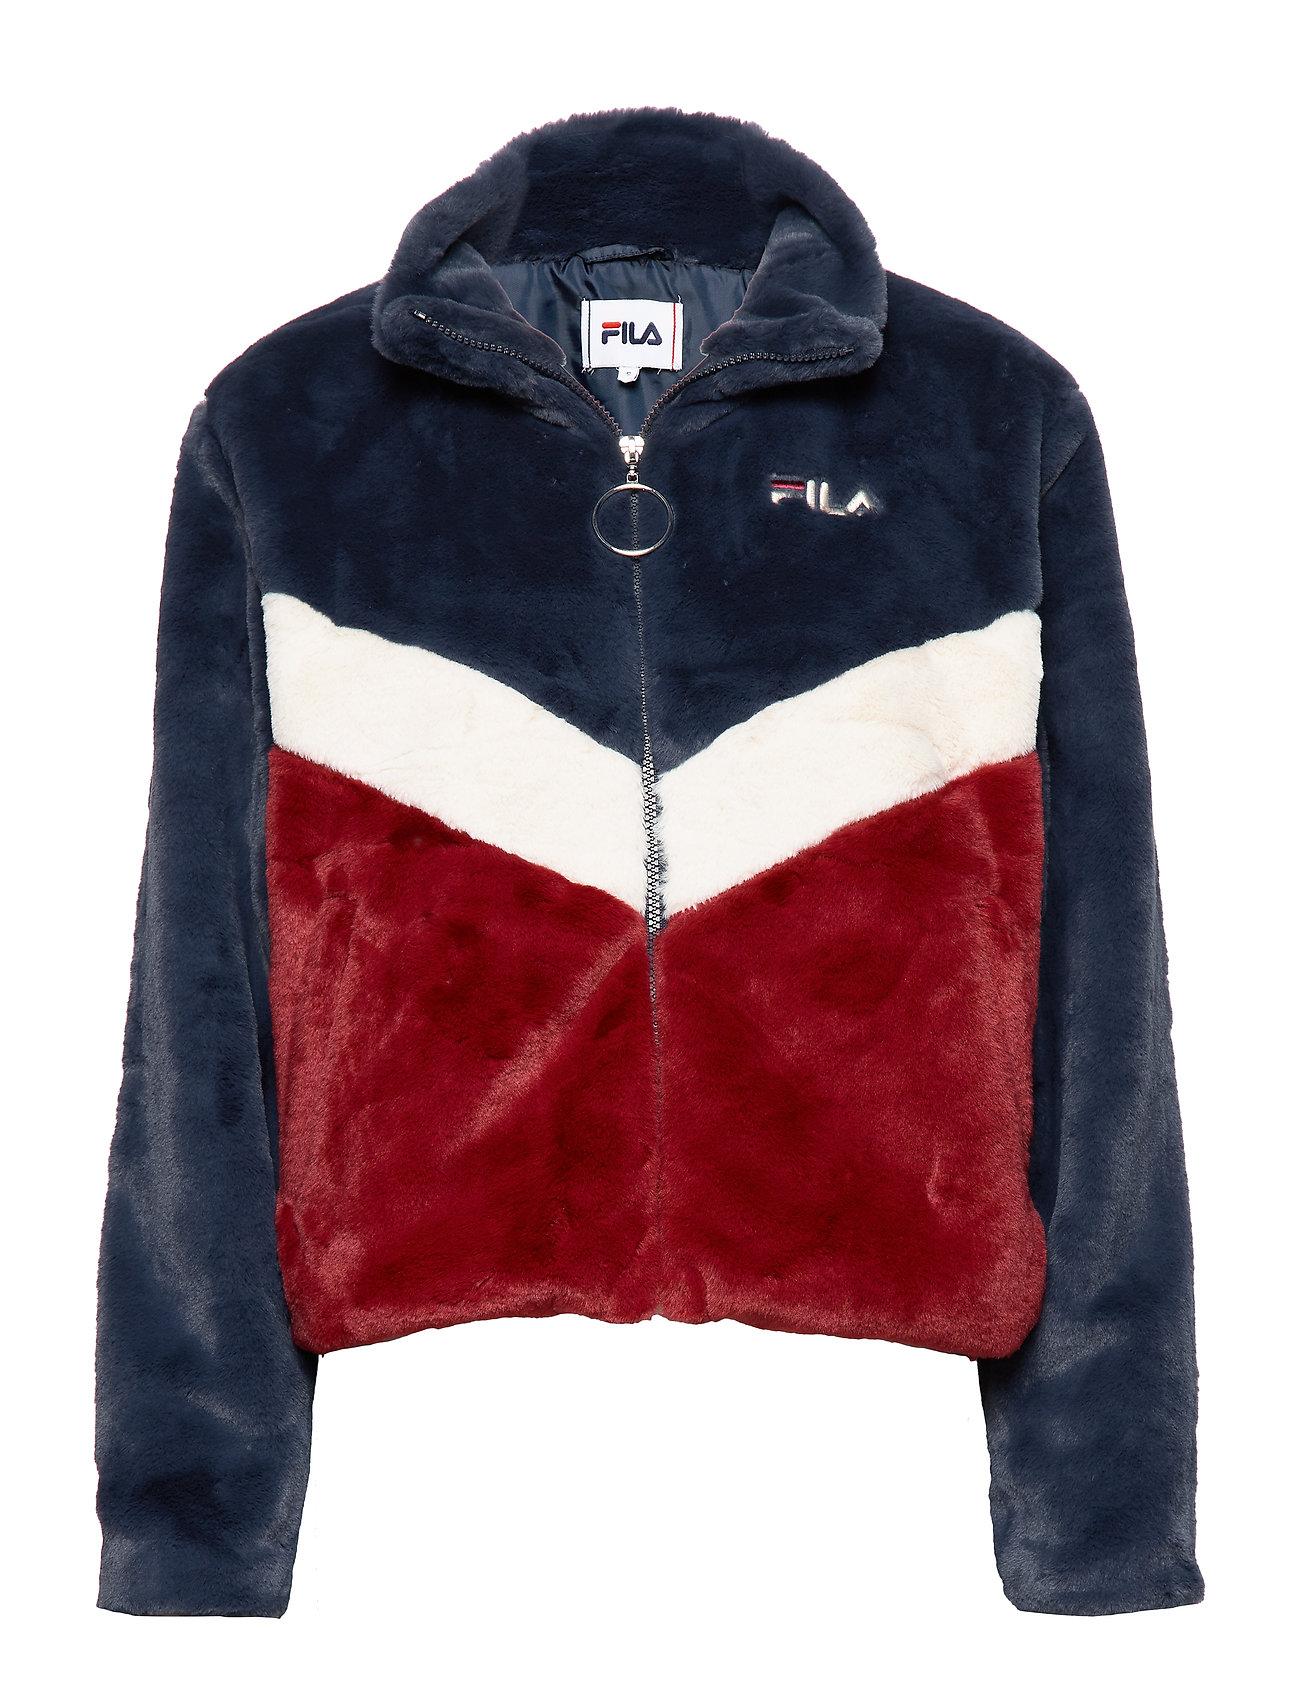 FILA WOMEN CHARMAINE jacket - A248 - BLACK IRIS-RHUBARB-WHITECAP GRAY